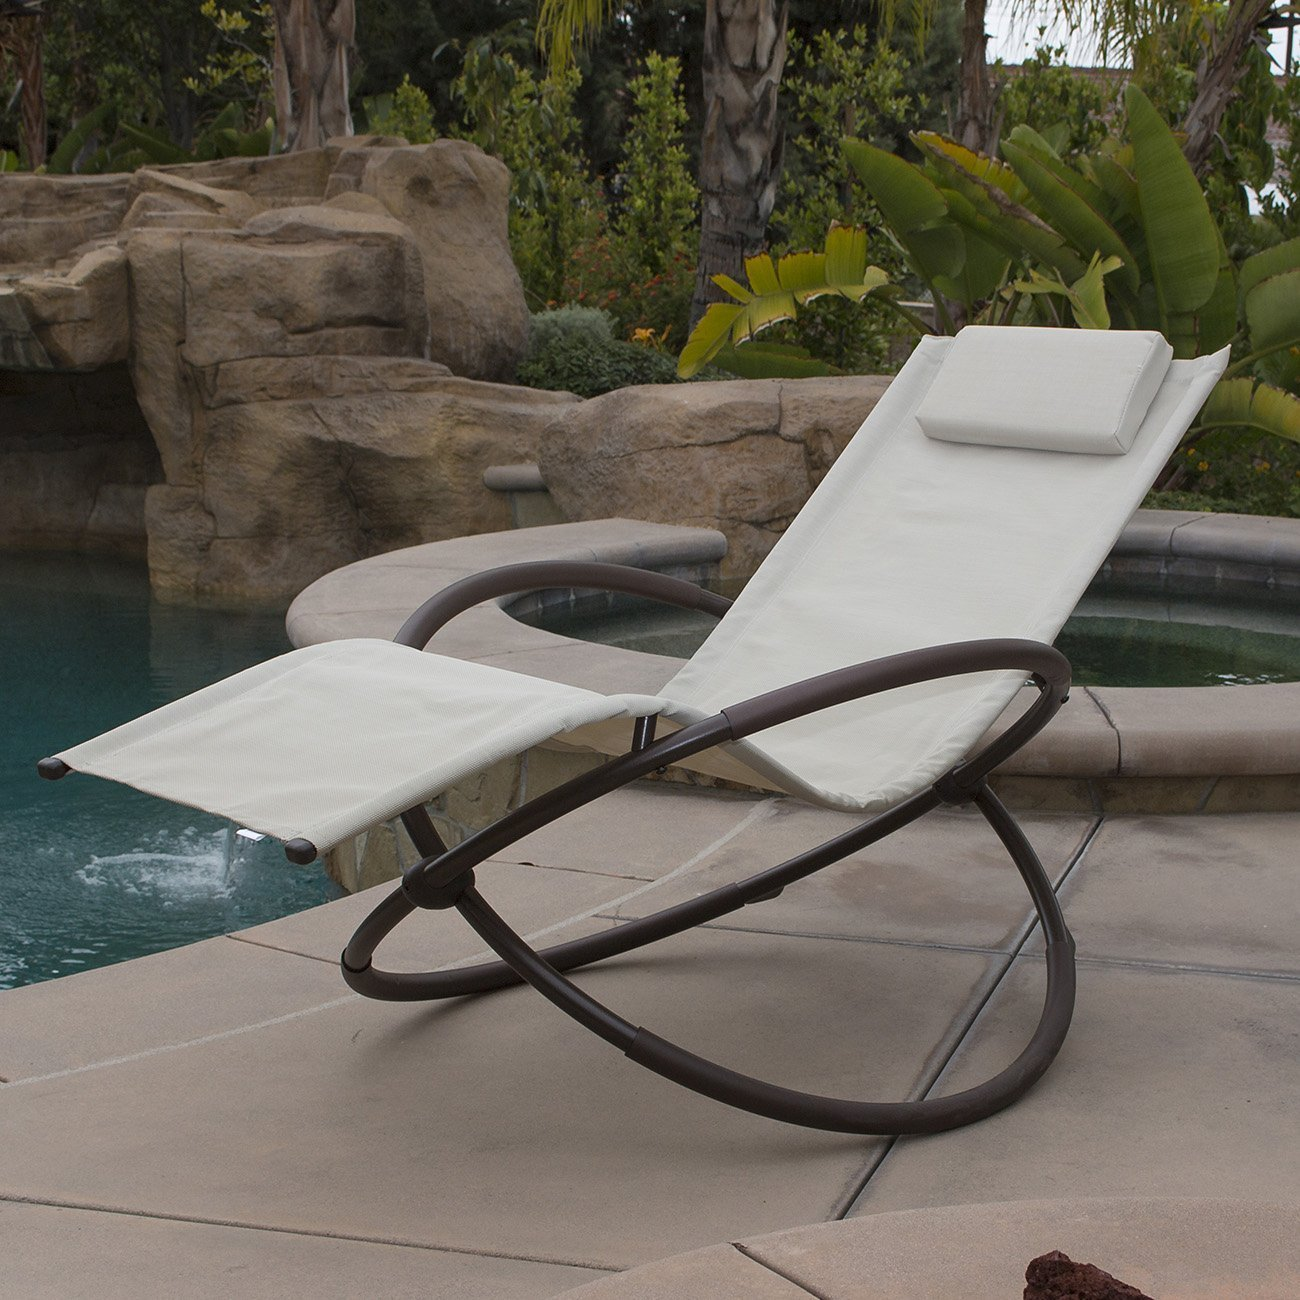 Genial Belleze Zero Gravity Orbital Lounger Rocking Chair Outdoor Patio Yard  Furniture, (Black)